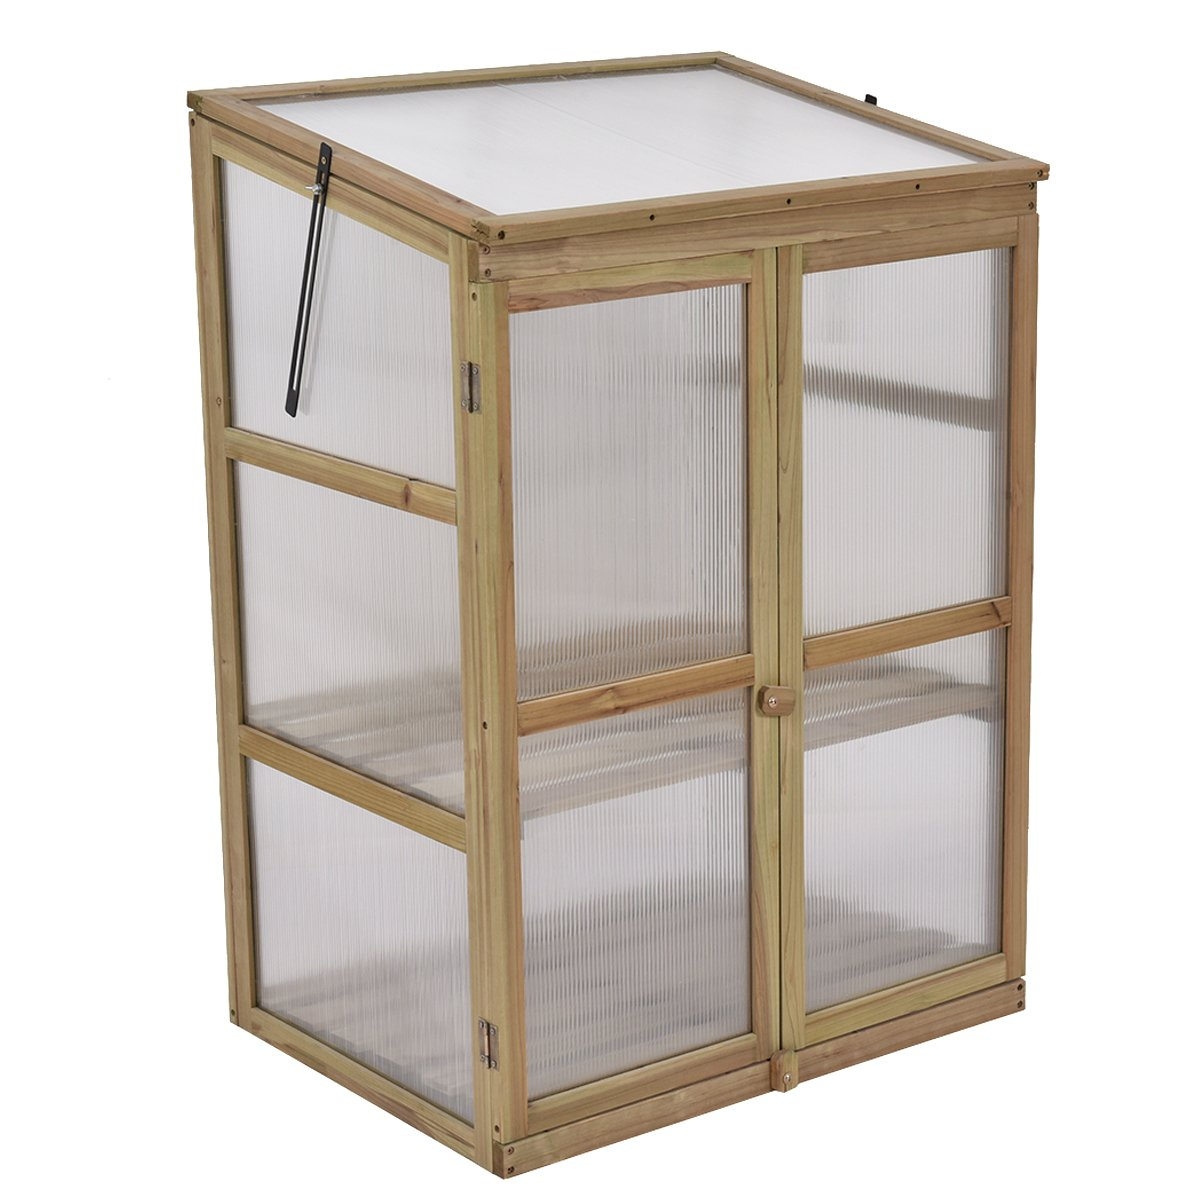 Giantex Garden Portable Wooden Cold Frame Greenhouse Raised Flower Planter Protection (30.0''X22.4''X42.9'')